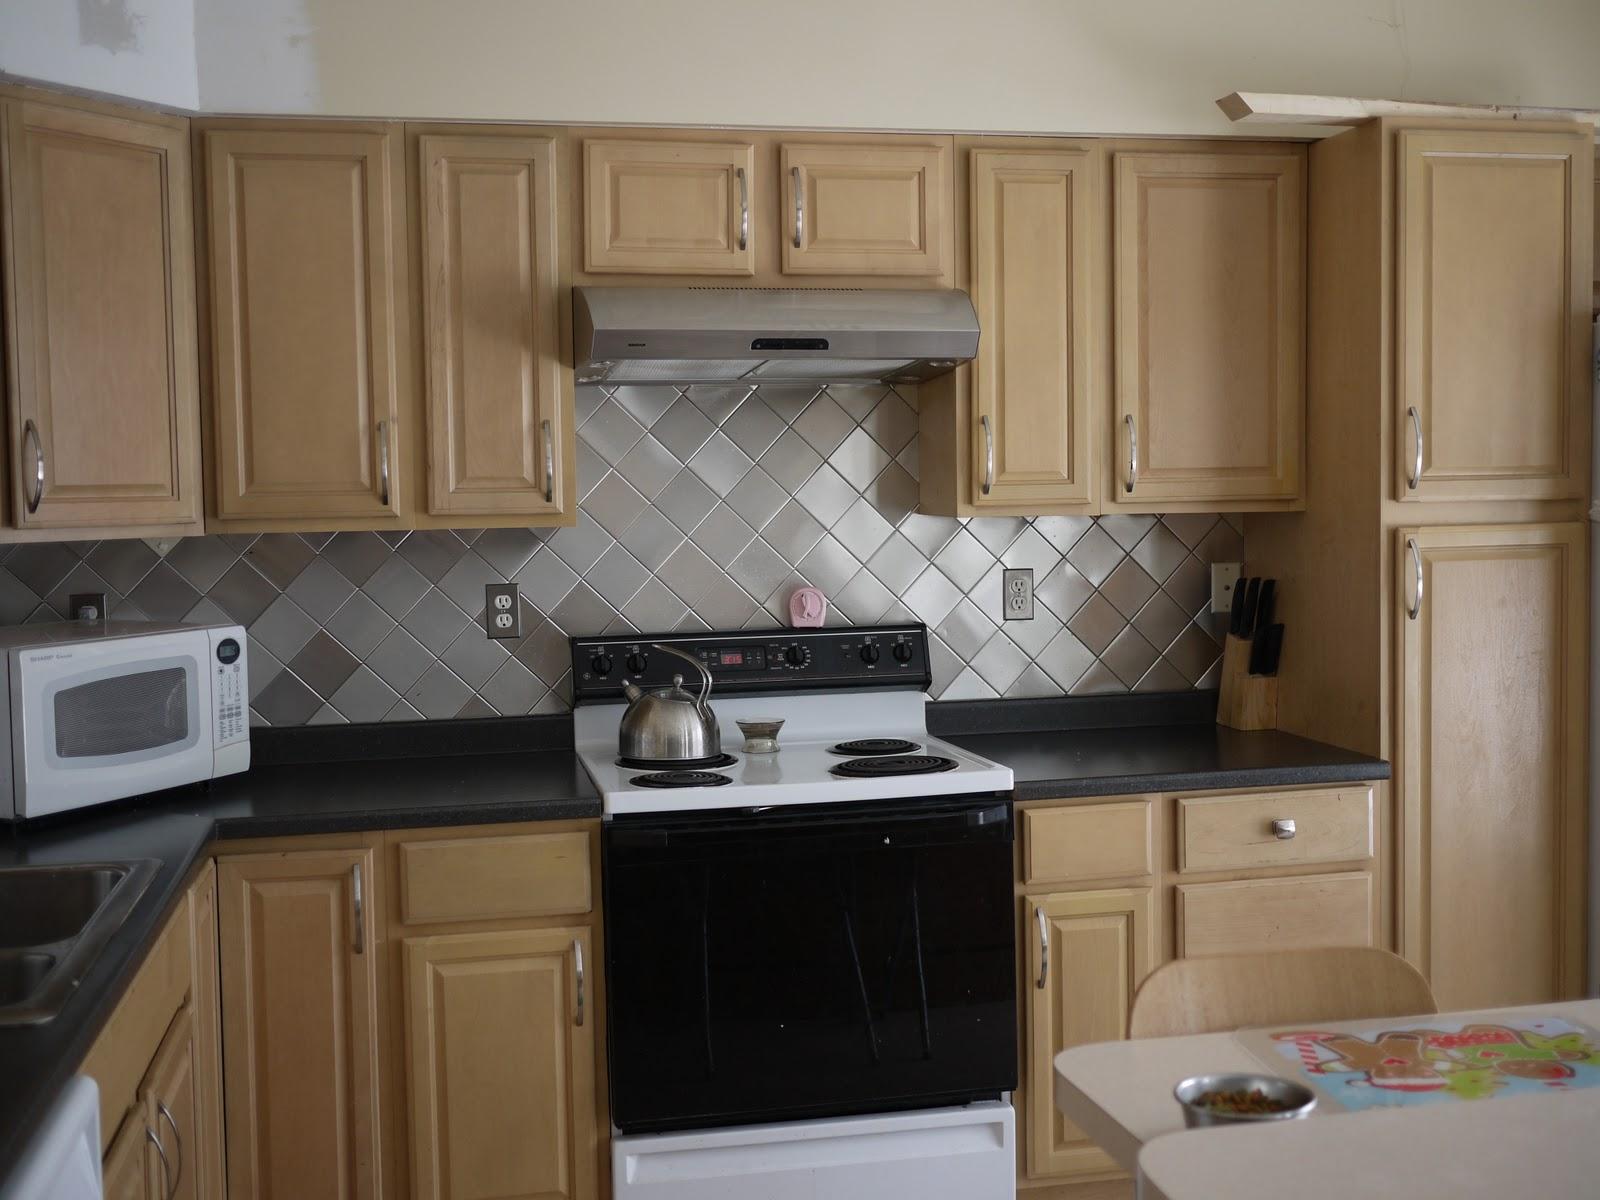 Kitchen Identity Crisis: Utility CabiGONE!